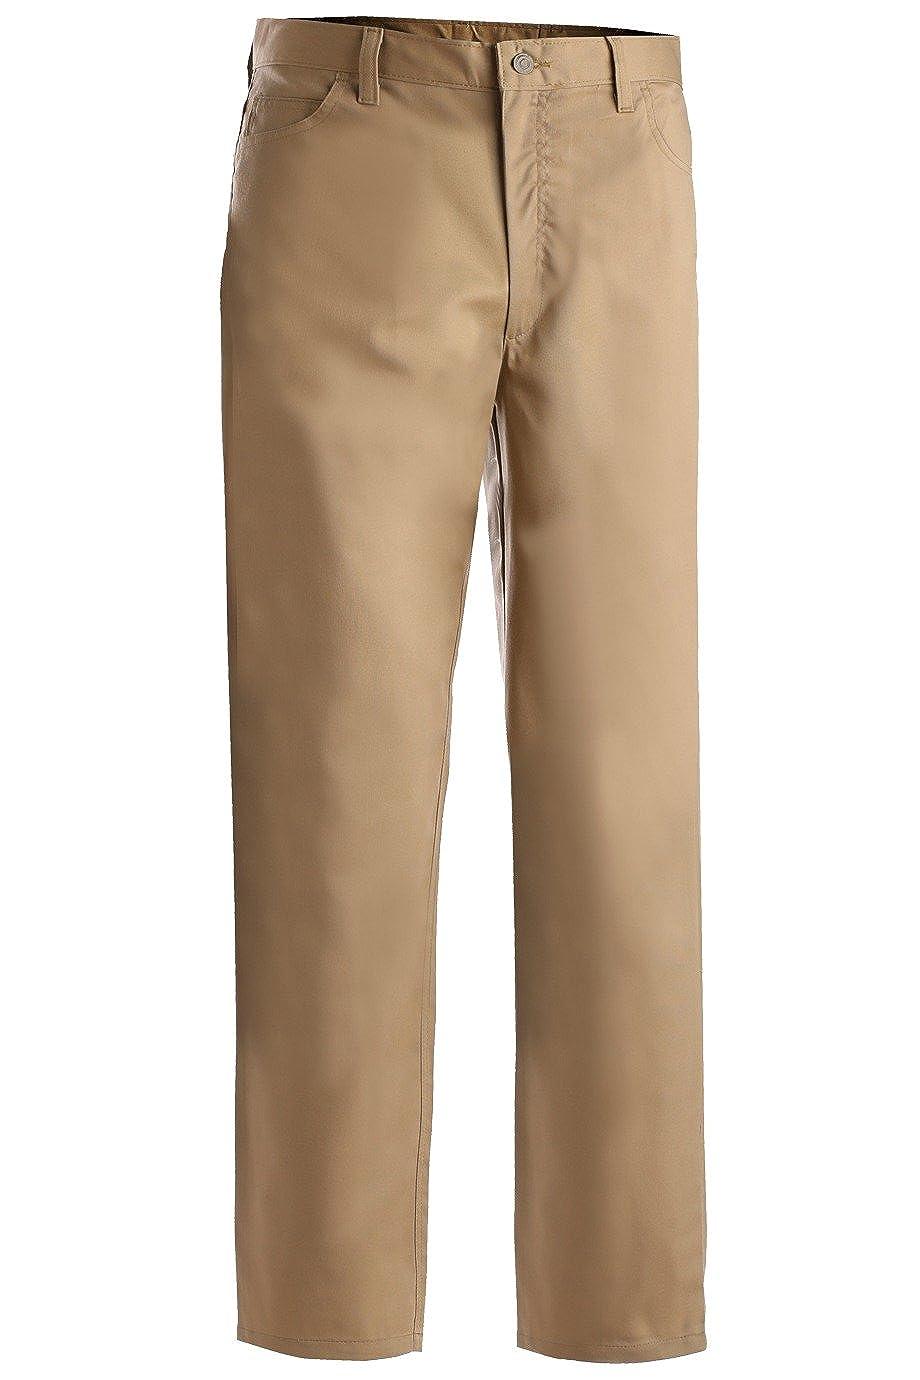 48 30 Edwards Mens Stretch Zipper Pocket Pant TAN